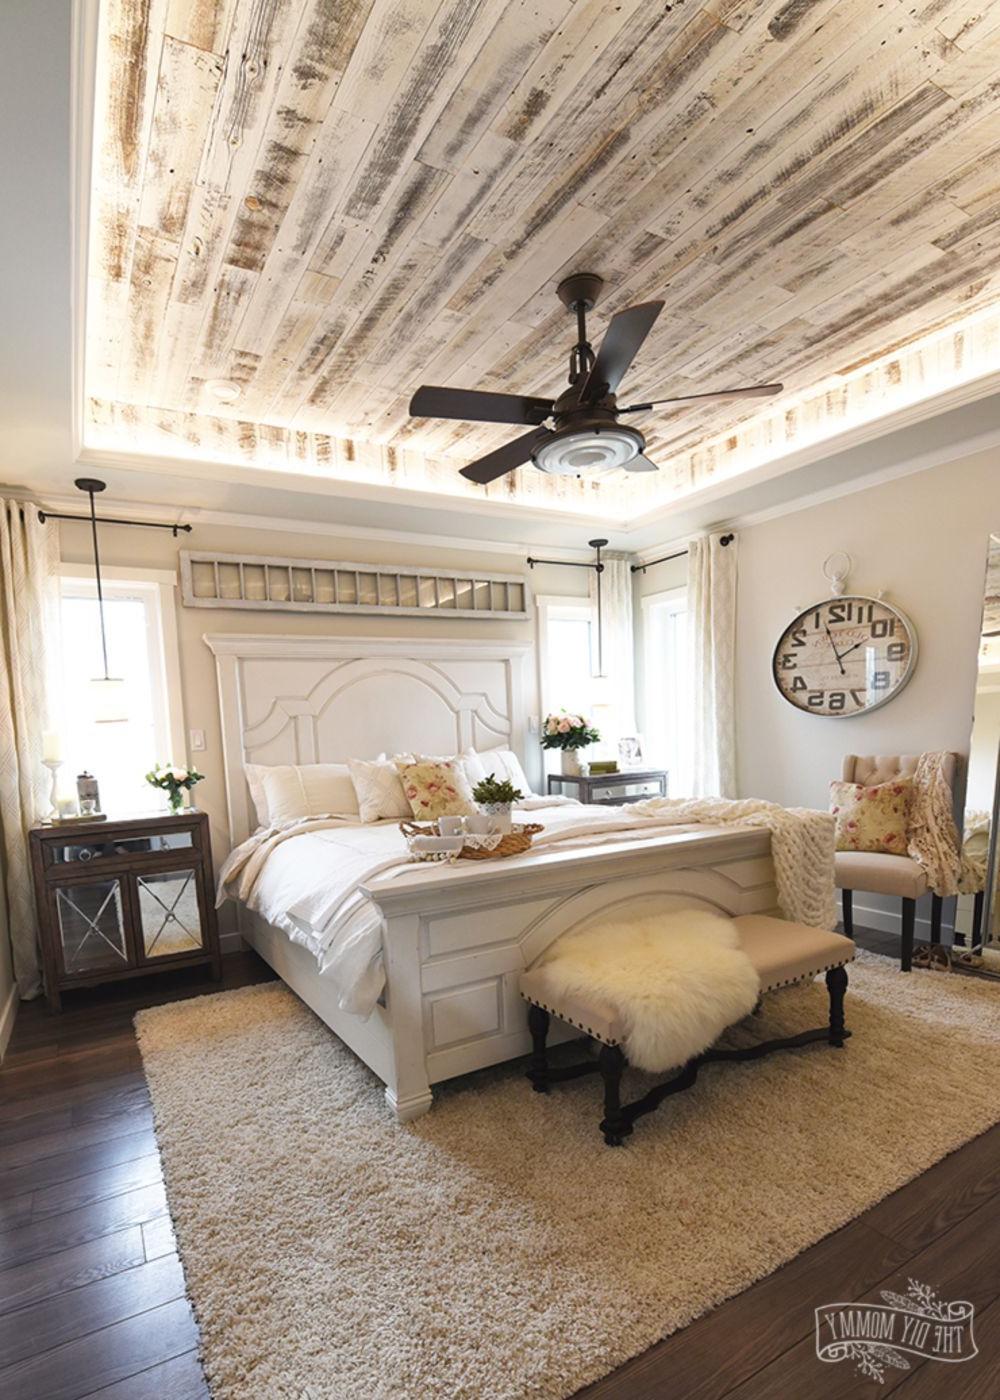 Amazing Ideas To Convert Room Into Farmhouse Bedroom Style